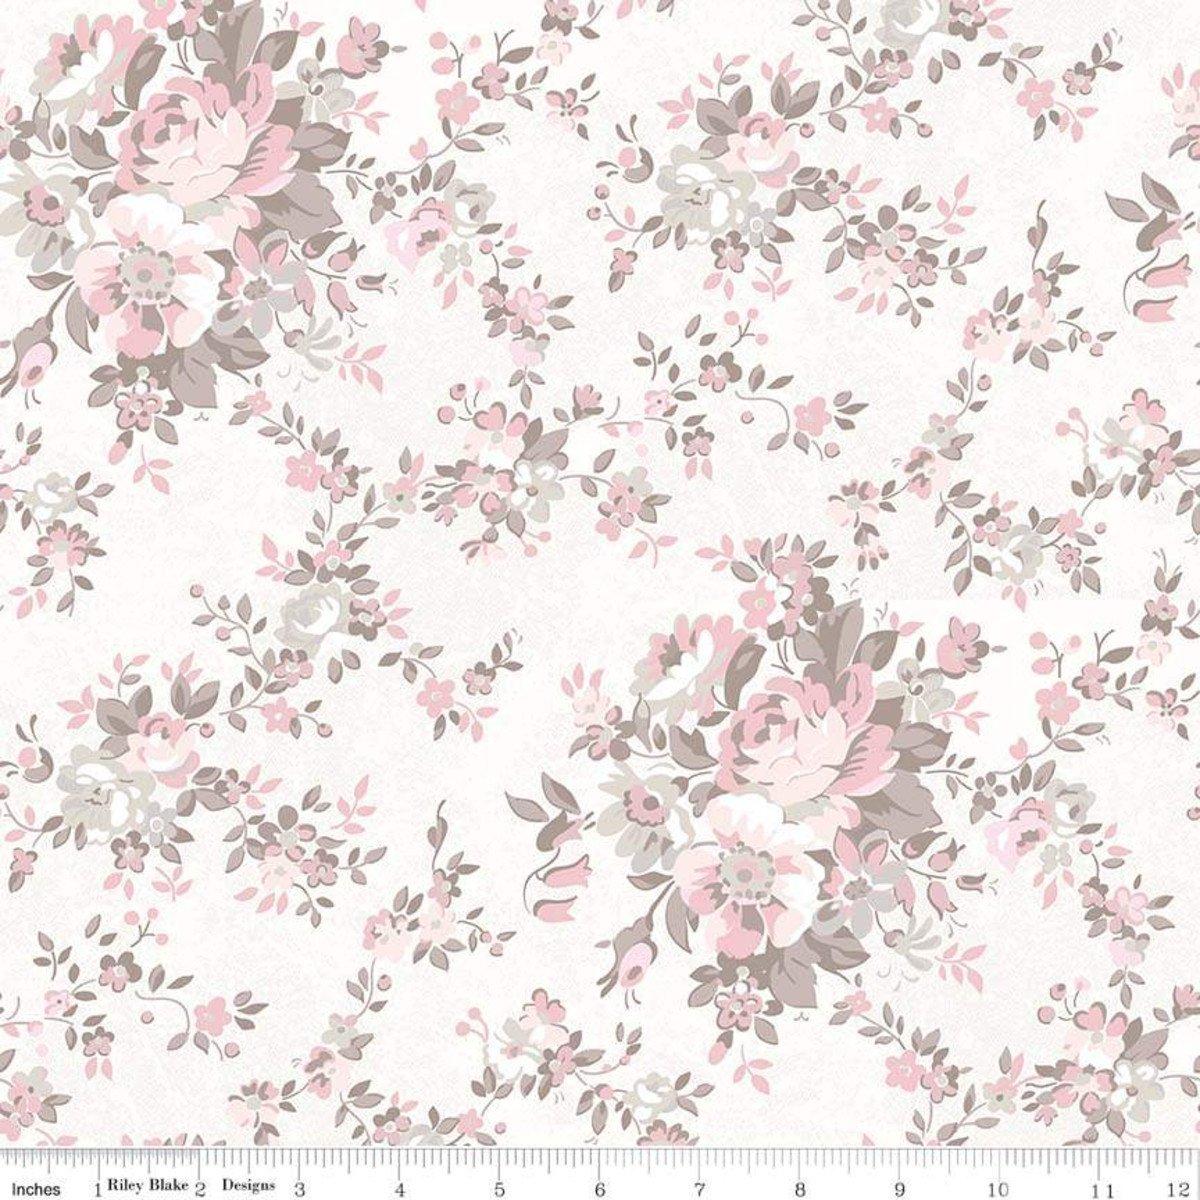 Riley Blake Rose Garden Floral Cream C7680 Cream